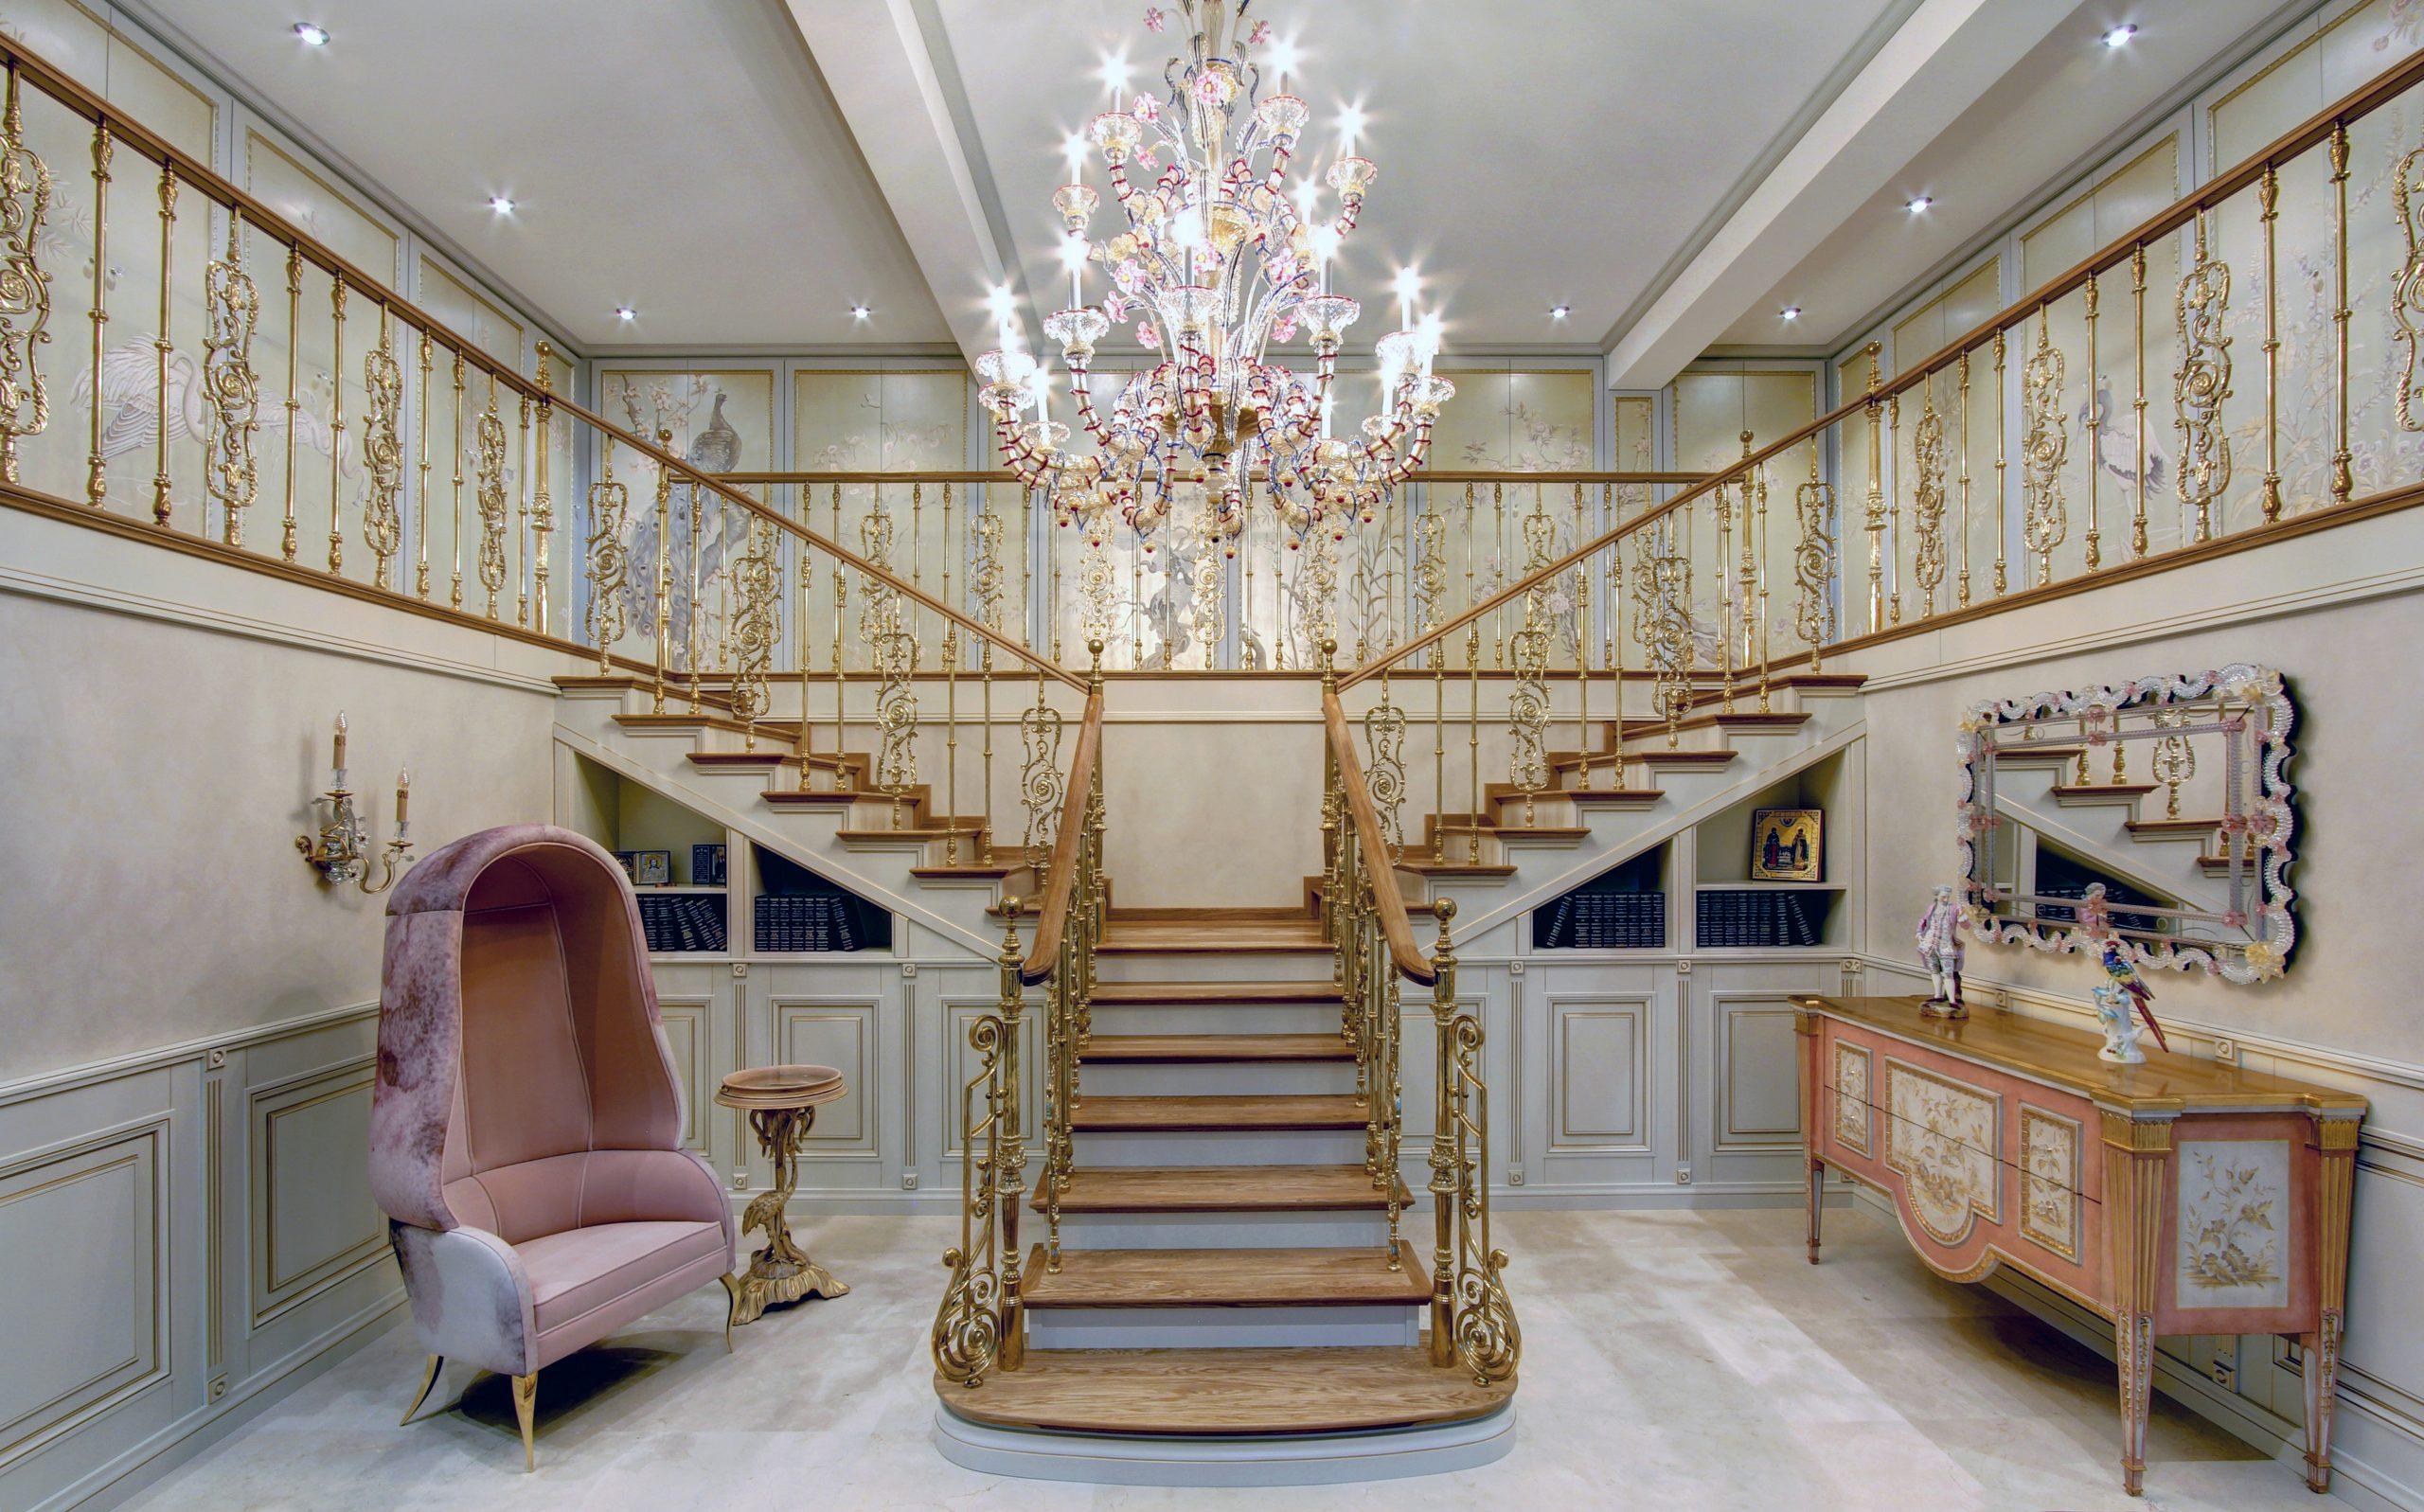 Svetlana Khristoforova KRAFT Foyer Staircase ornate luxury country house design inspiration